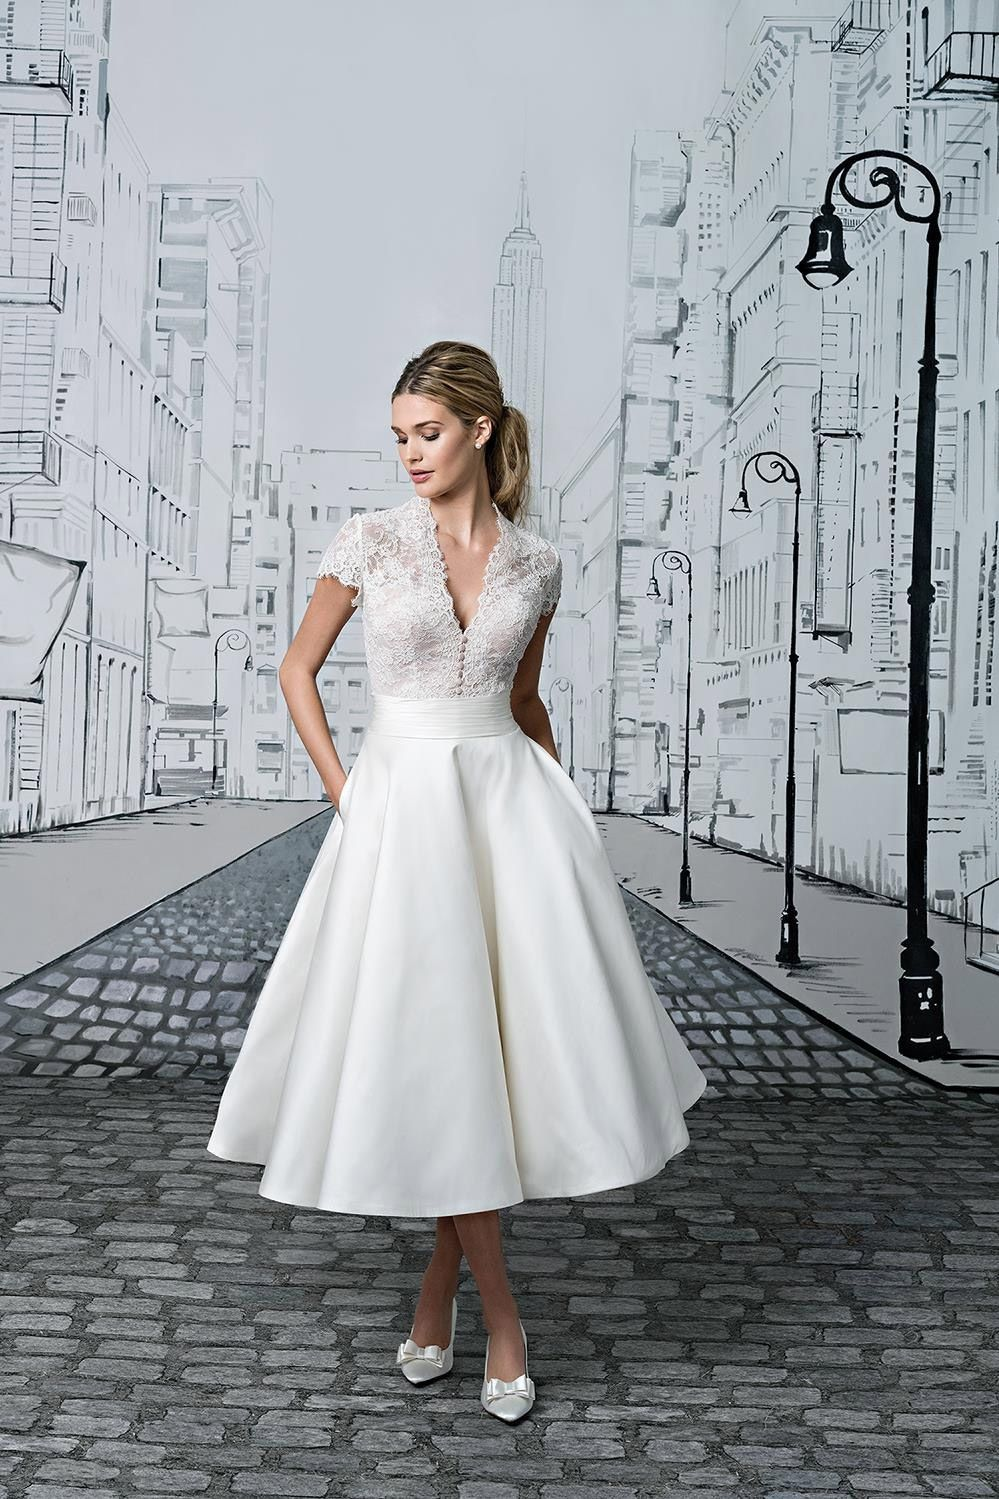 Vintage wedding tea dress   Vintage Wedding Tea Dress  Wedding Dresses for Plus Size Check